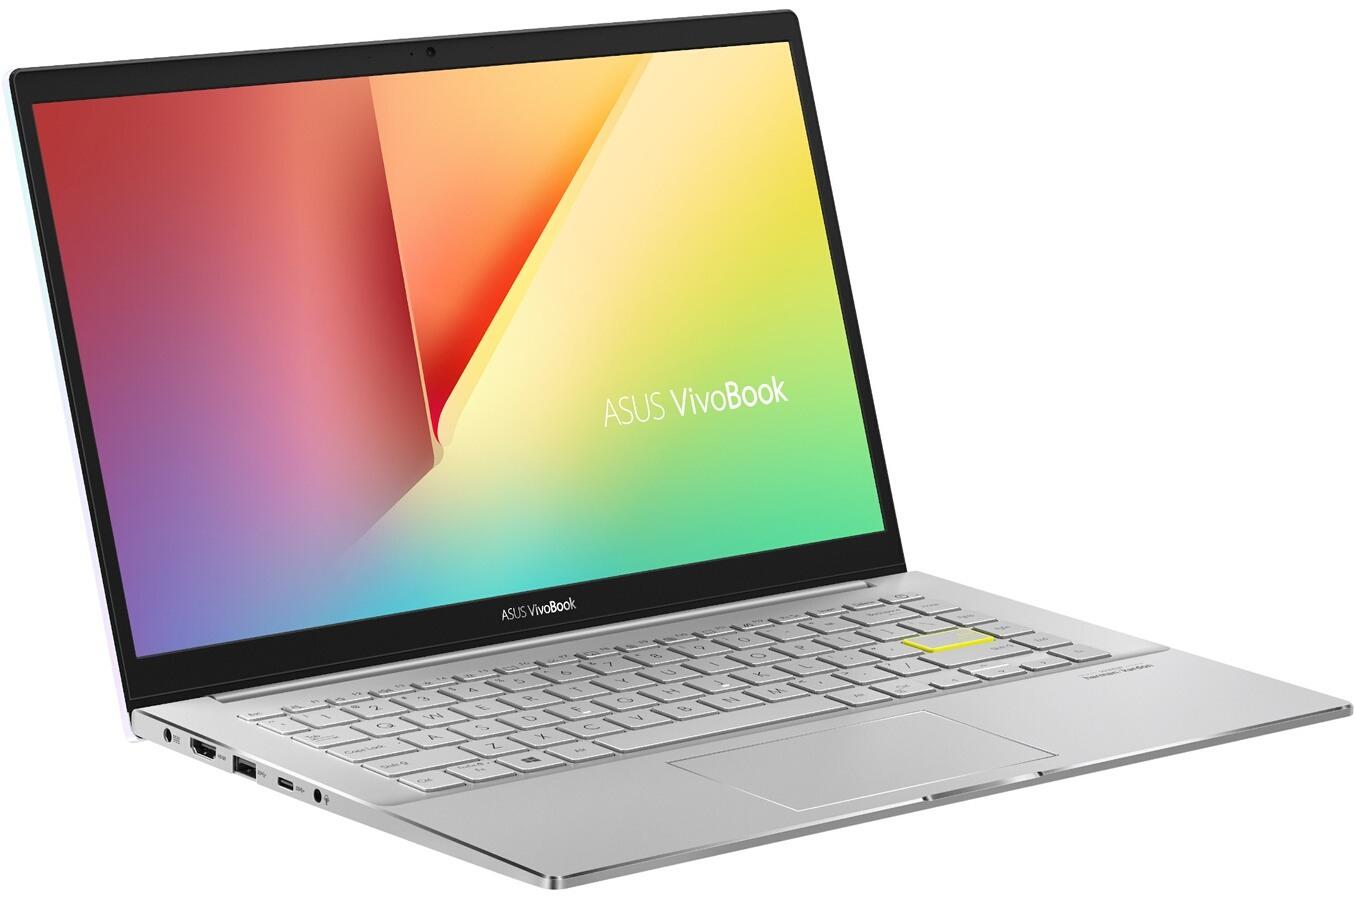 "PC Portable 14"" FHD IPS ASUS S433IA-EB373T - Ryzen 7 4700u, RAM 8 Go, SSD 512 Go, Windows 10"